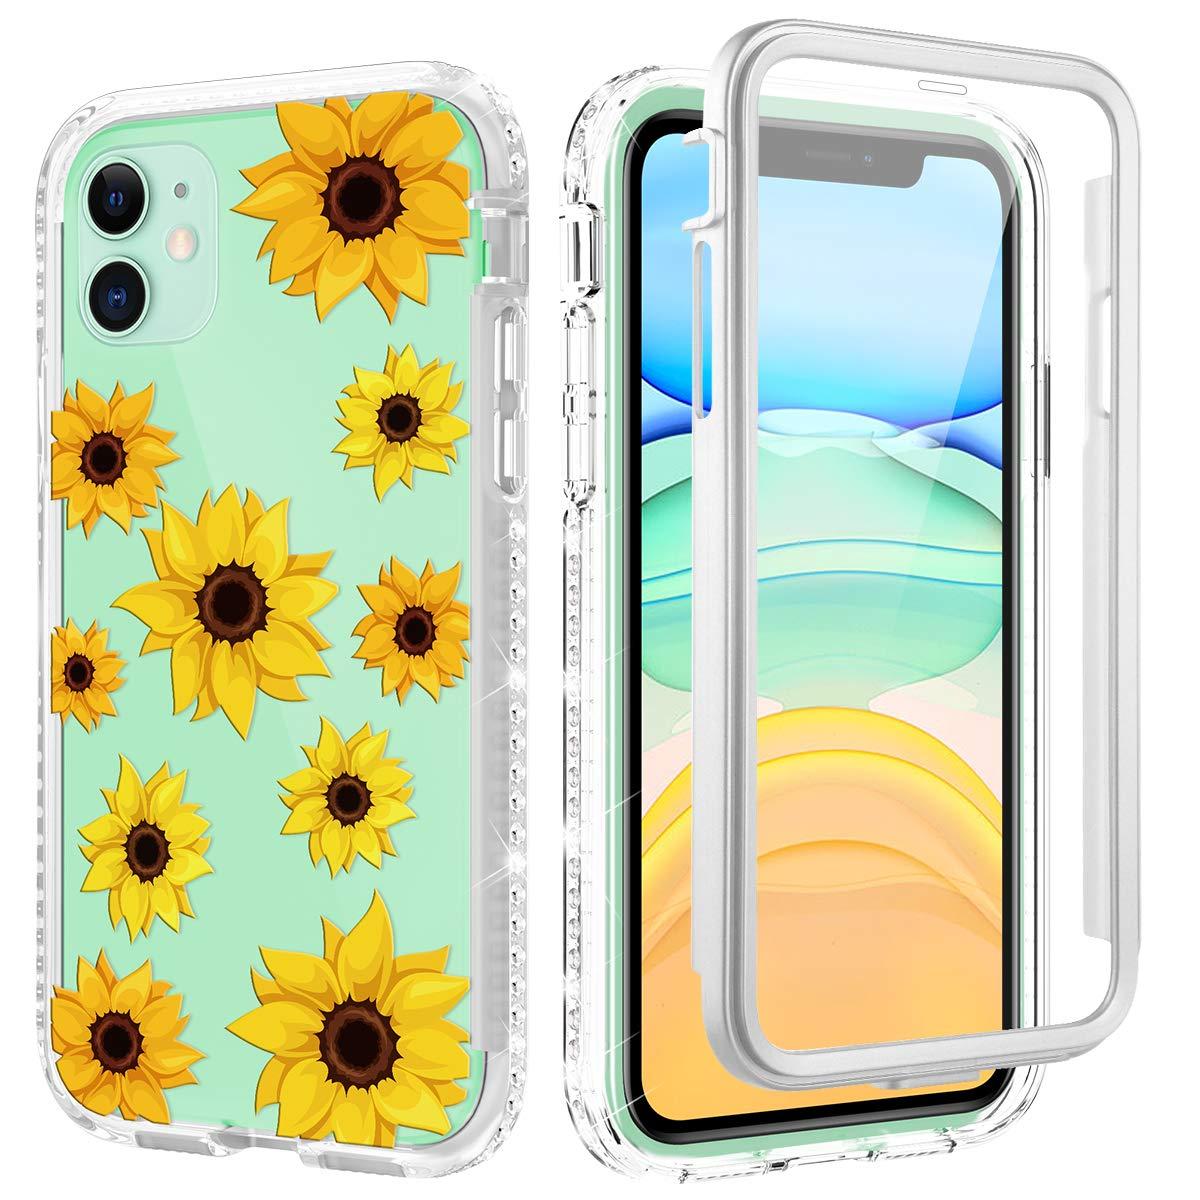 Caka Flower Case for iPhone 11 Glitter Case Women Girls Girly Full Body Shockproof Glitter Diamond Bling Shining Yellow Floral Heavy Duty Clear Phone Case for iPhone 11 (2019) (Sunflower)